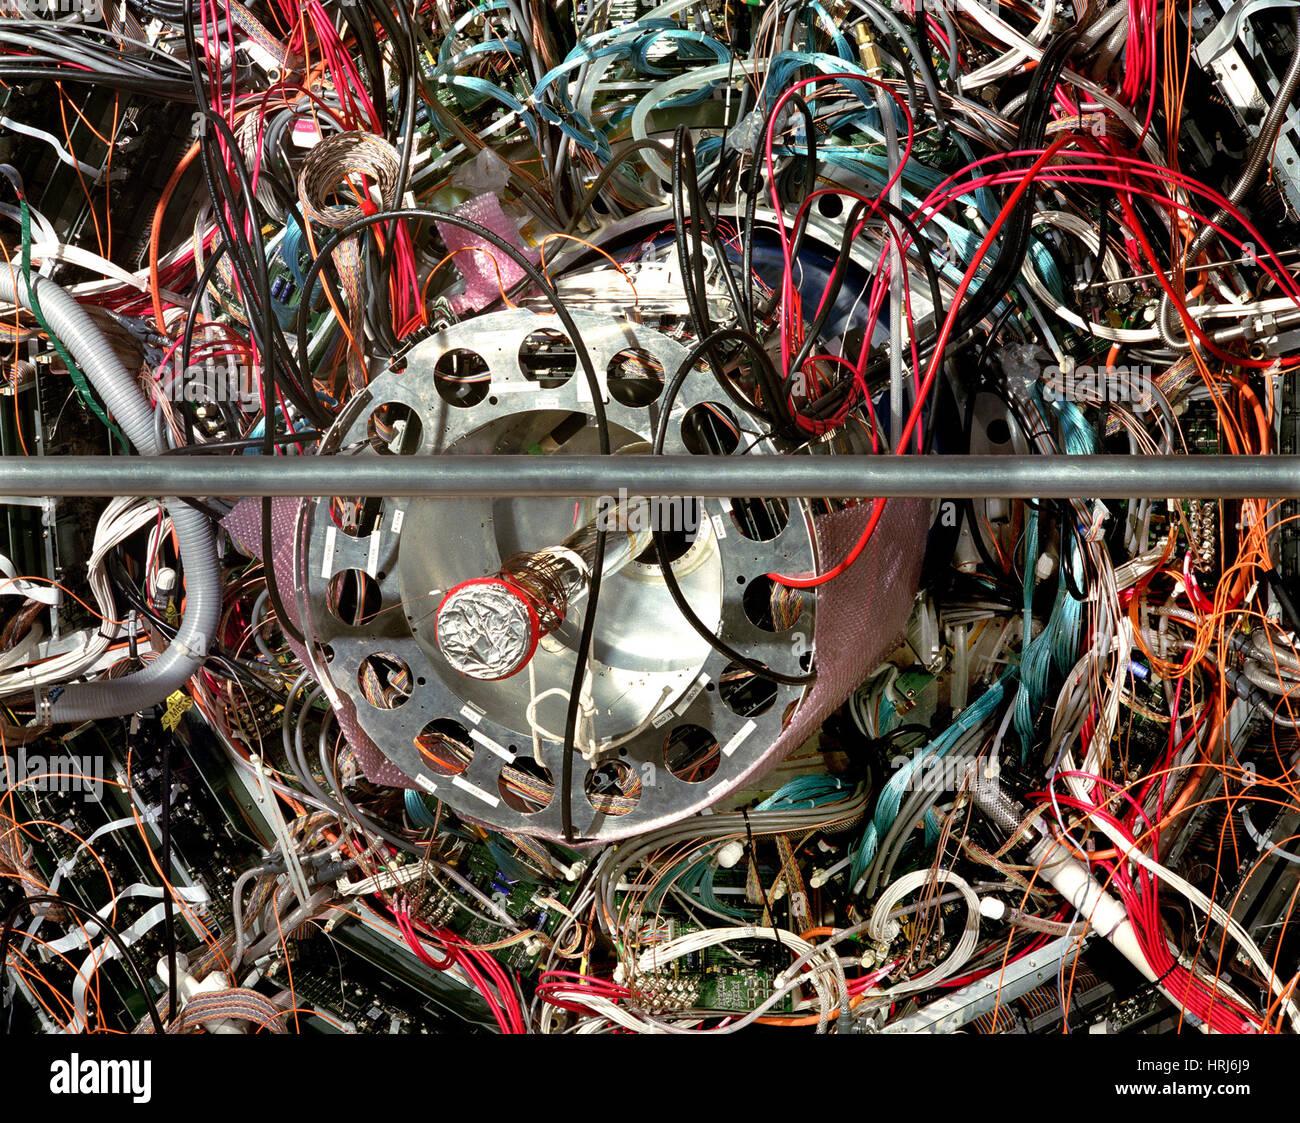 STAR Detector, 2009 - Stock Image